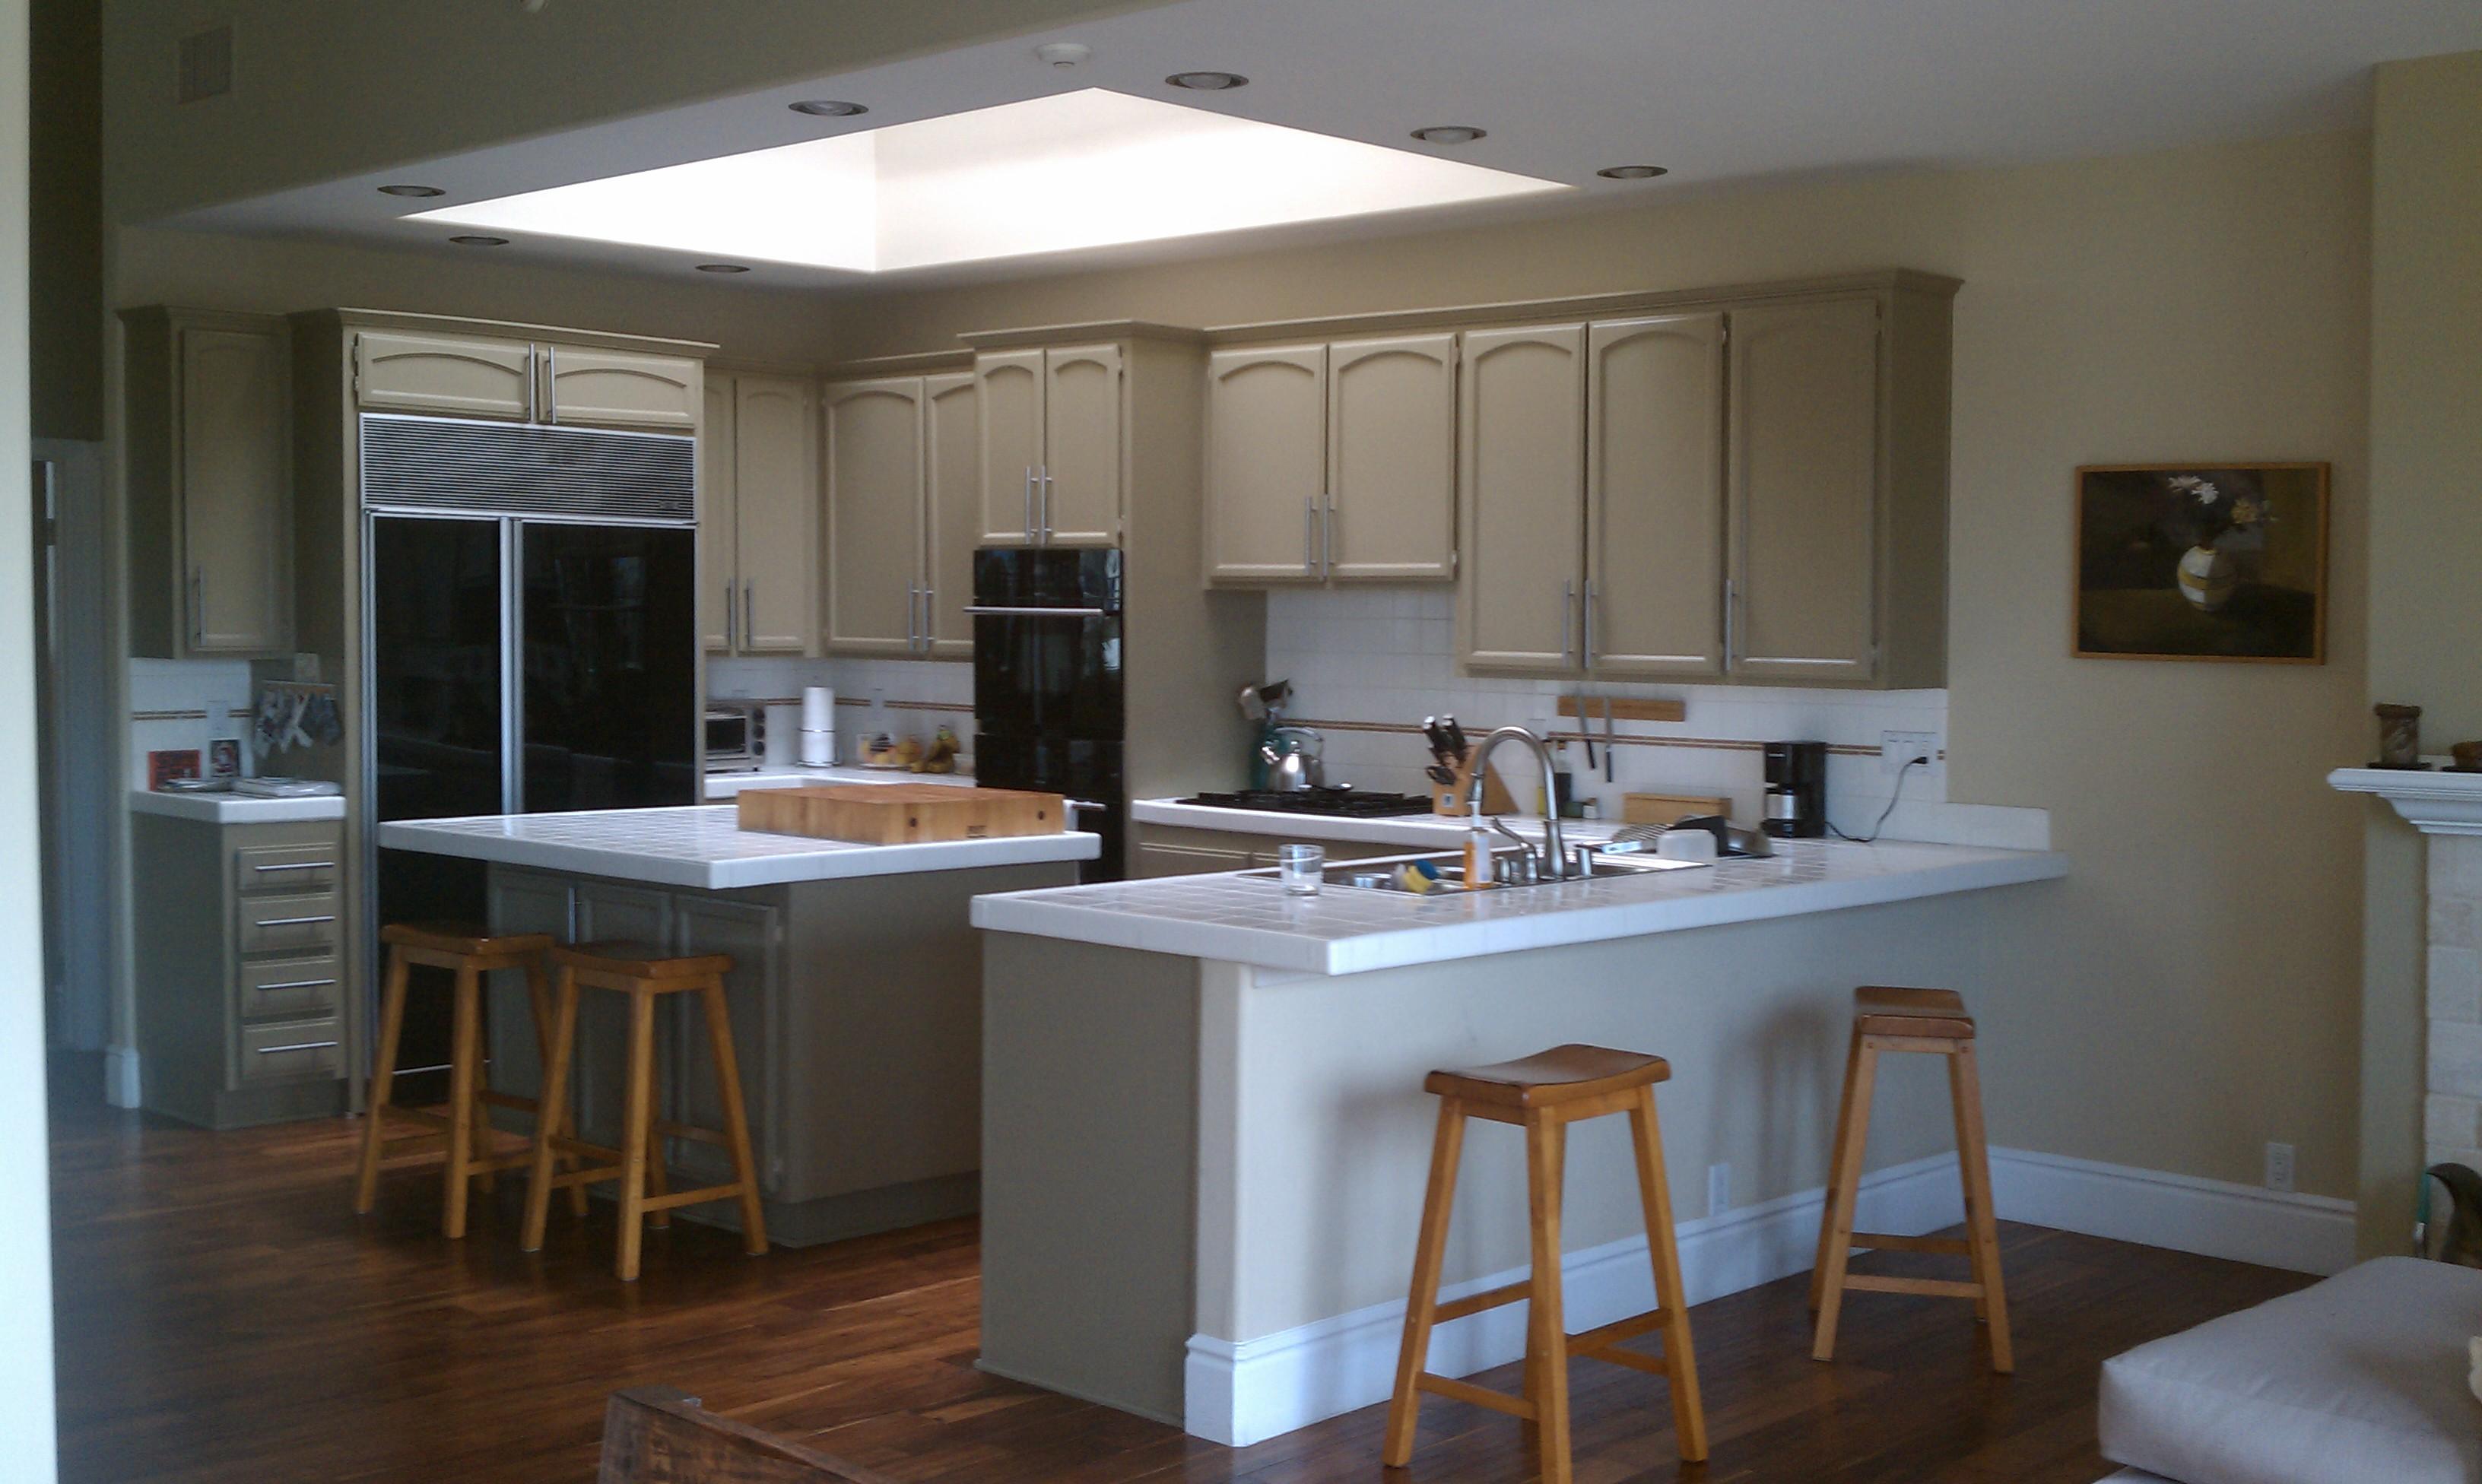 ikea kitchen bar cheap sinks open walls for a sunny